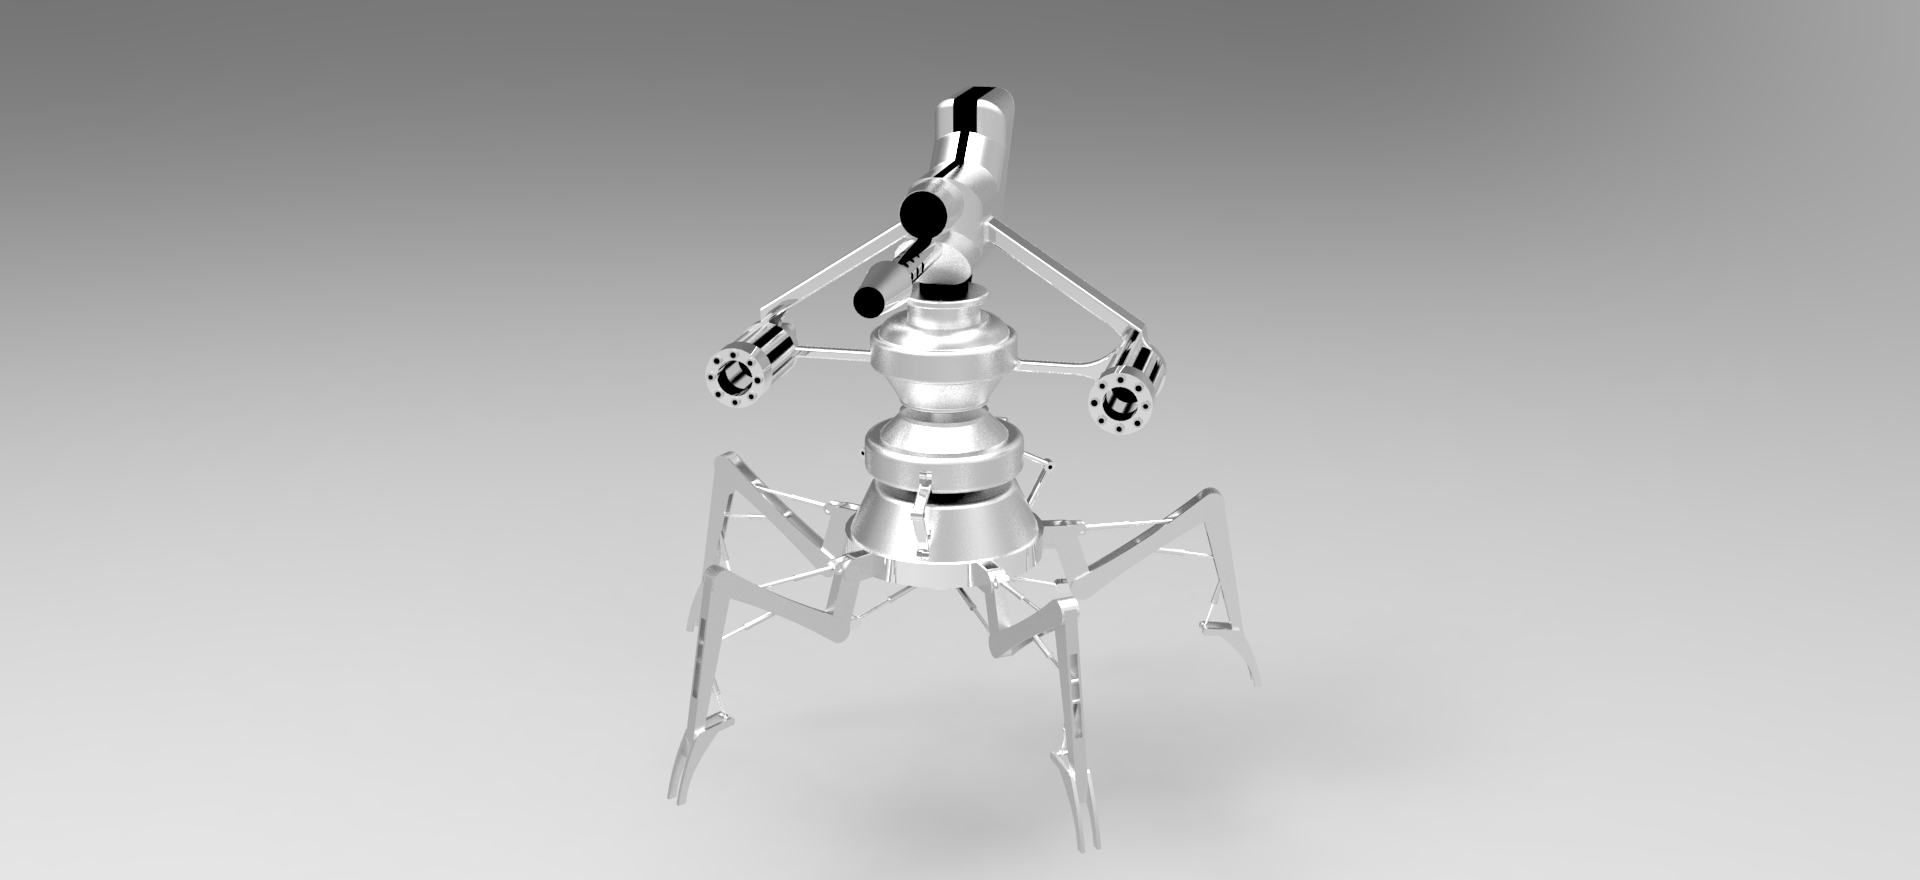 solidworks robot çizimi